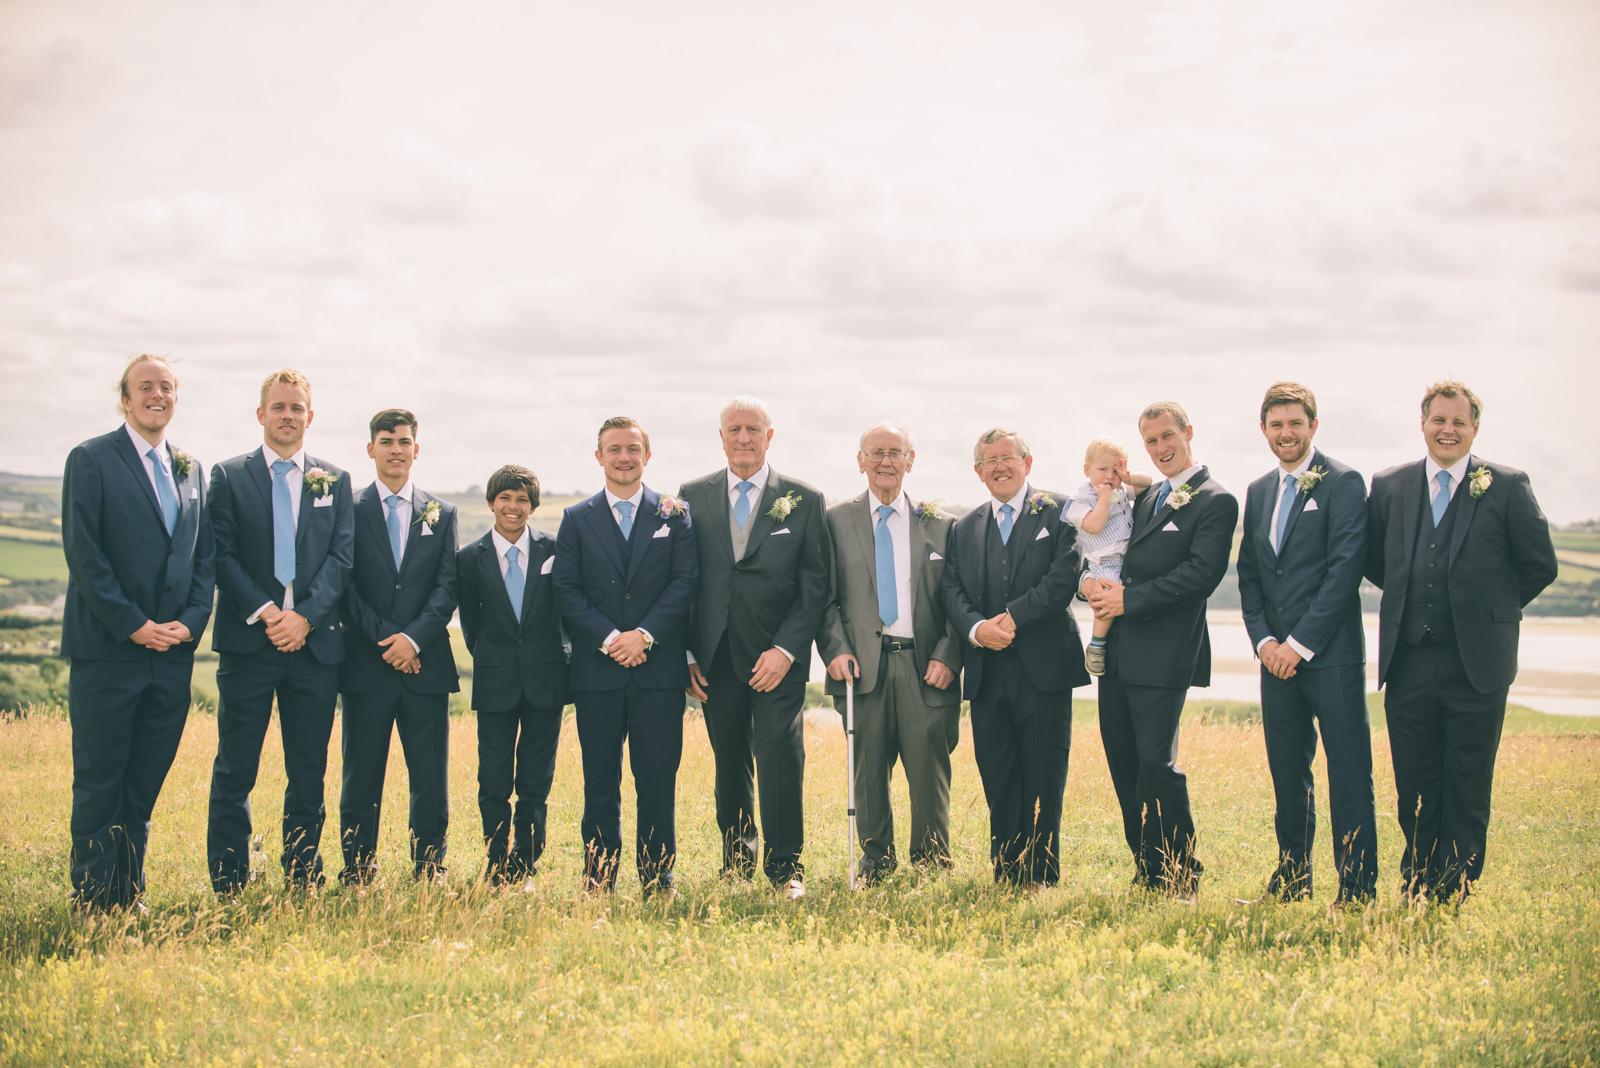 wedding-photography-rock-119.jpg